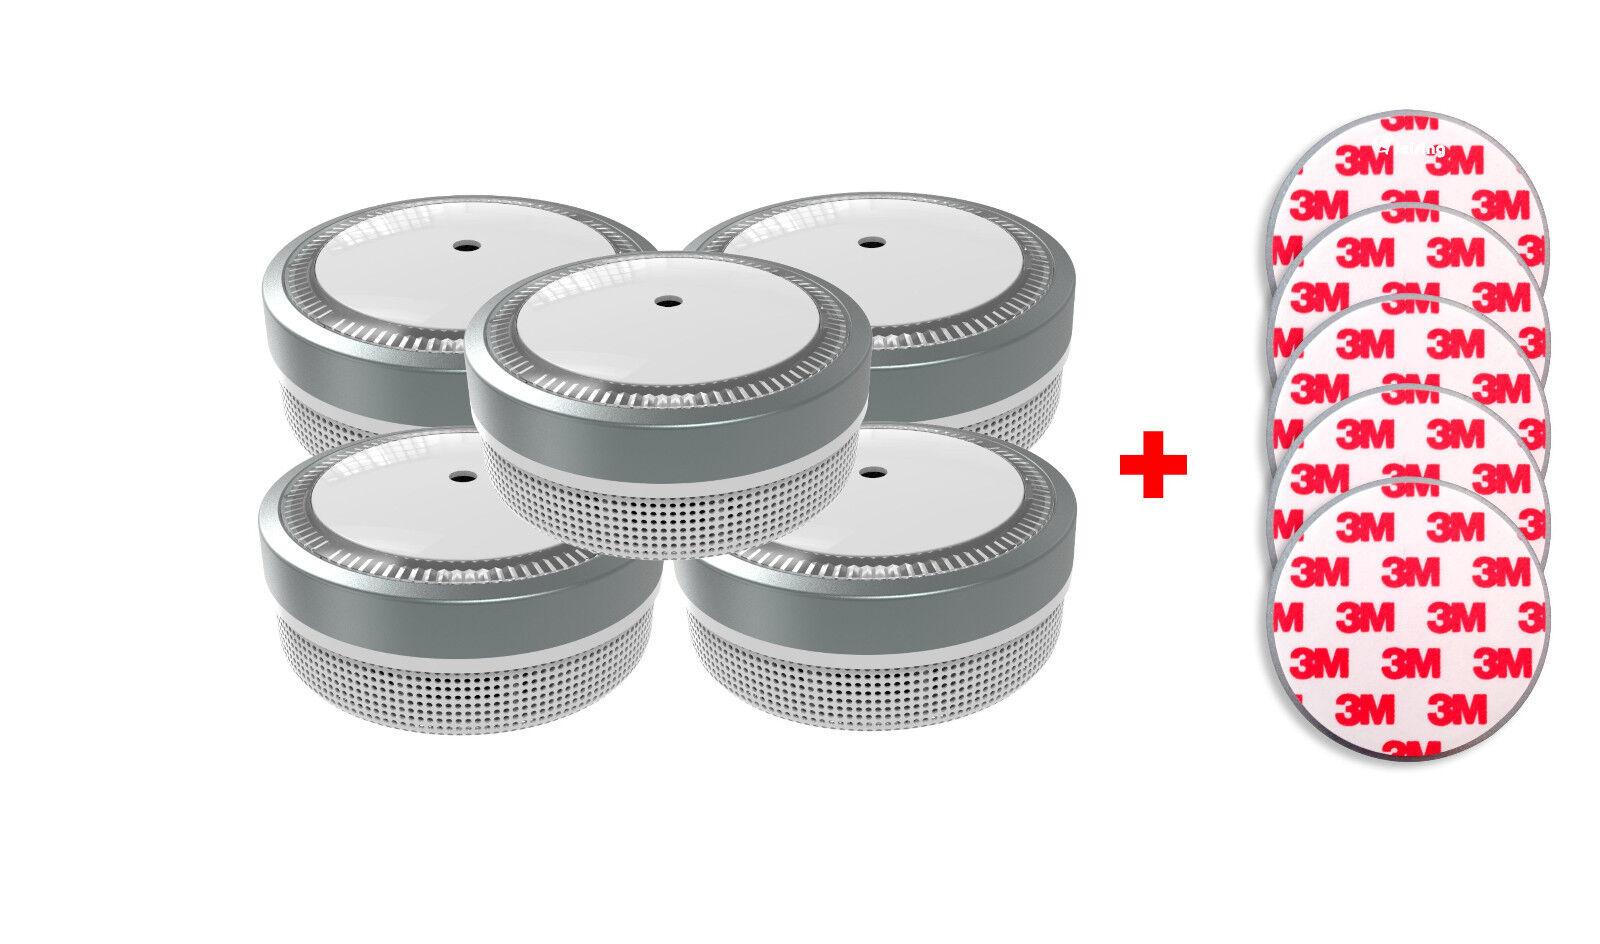 Jeising Mini Rauchmelder RWM100-G  5er Set mit Magnetpad,VDS, 10 Jahres Batterie